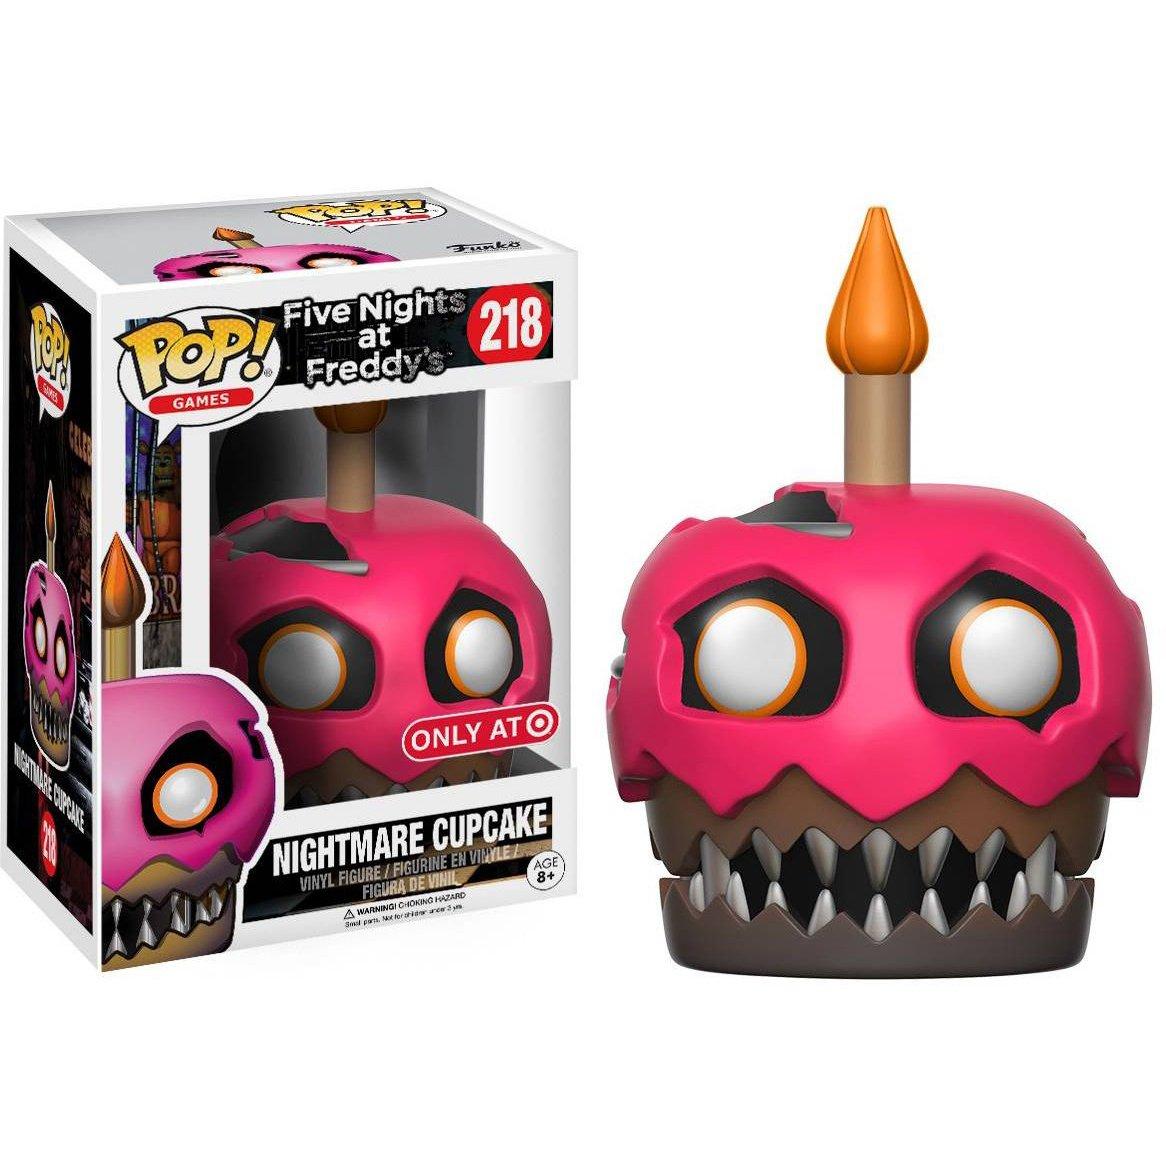 : Five Nights at Freddys x Funko POP Target Exclusive BCC94092P #218 // 13736 - B Nightmare Cupcake Games Vinyl Figure /& 1 PET Plastic Graphical Protector Bundle